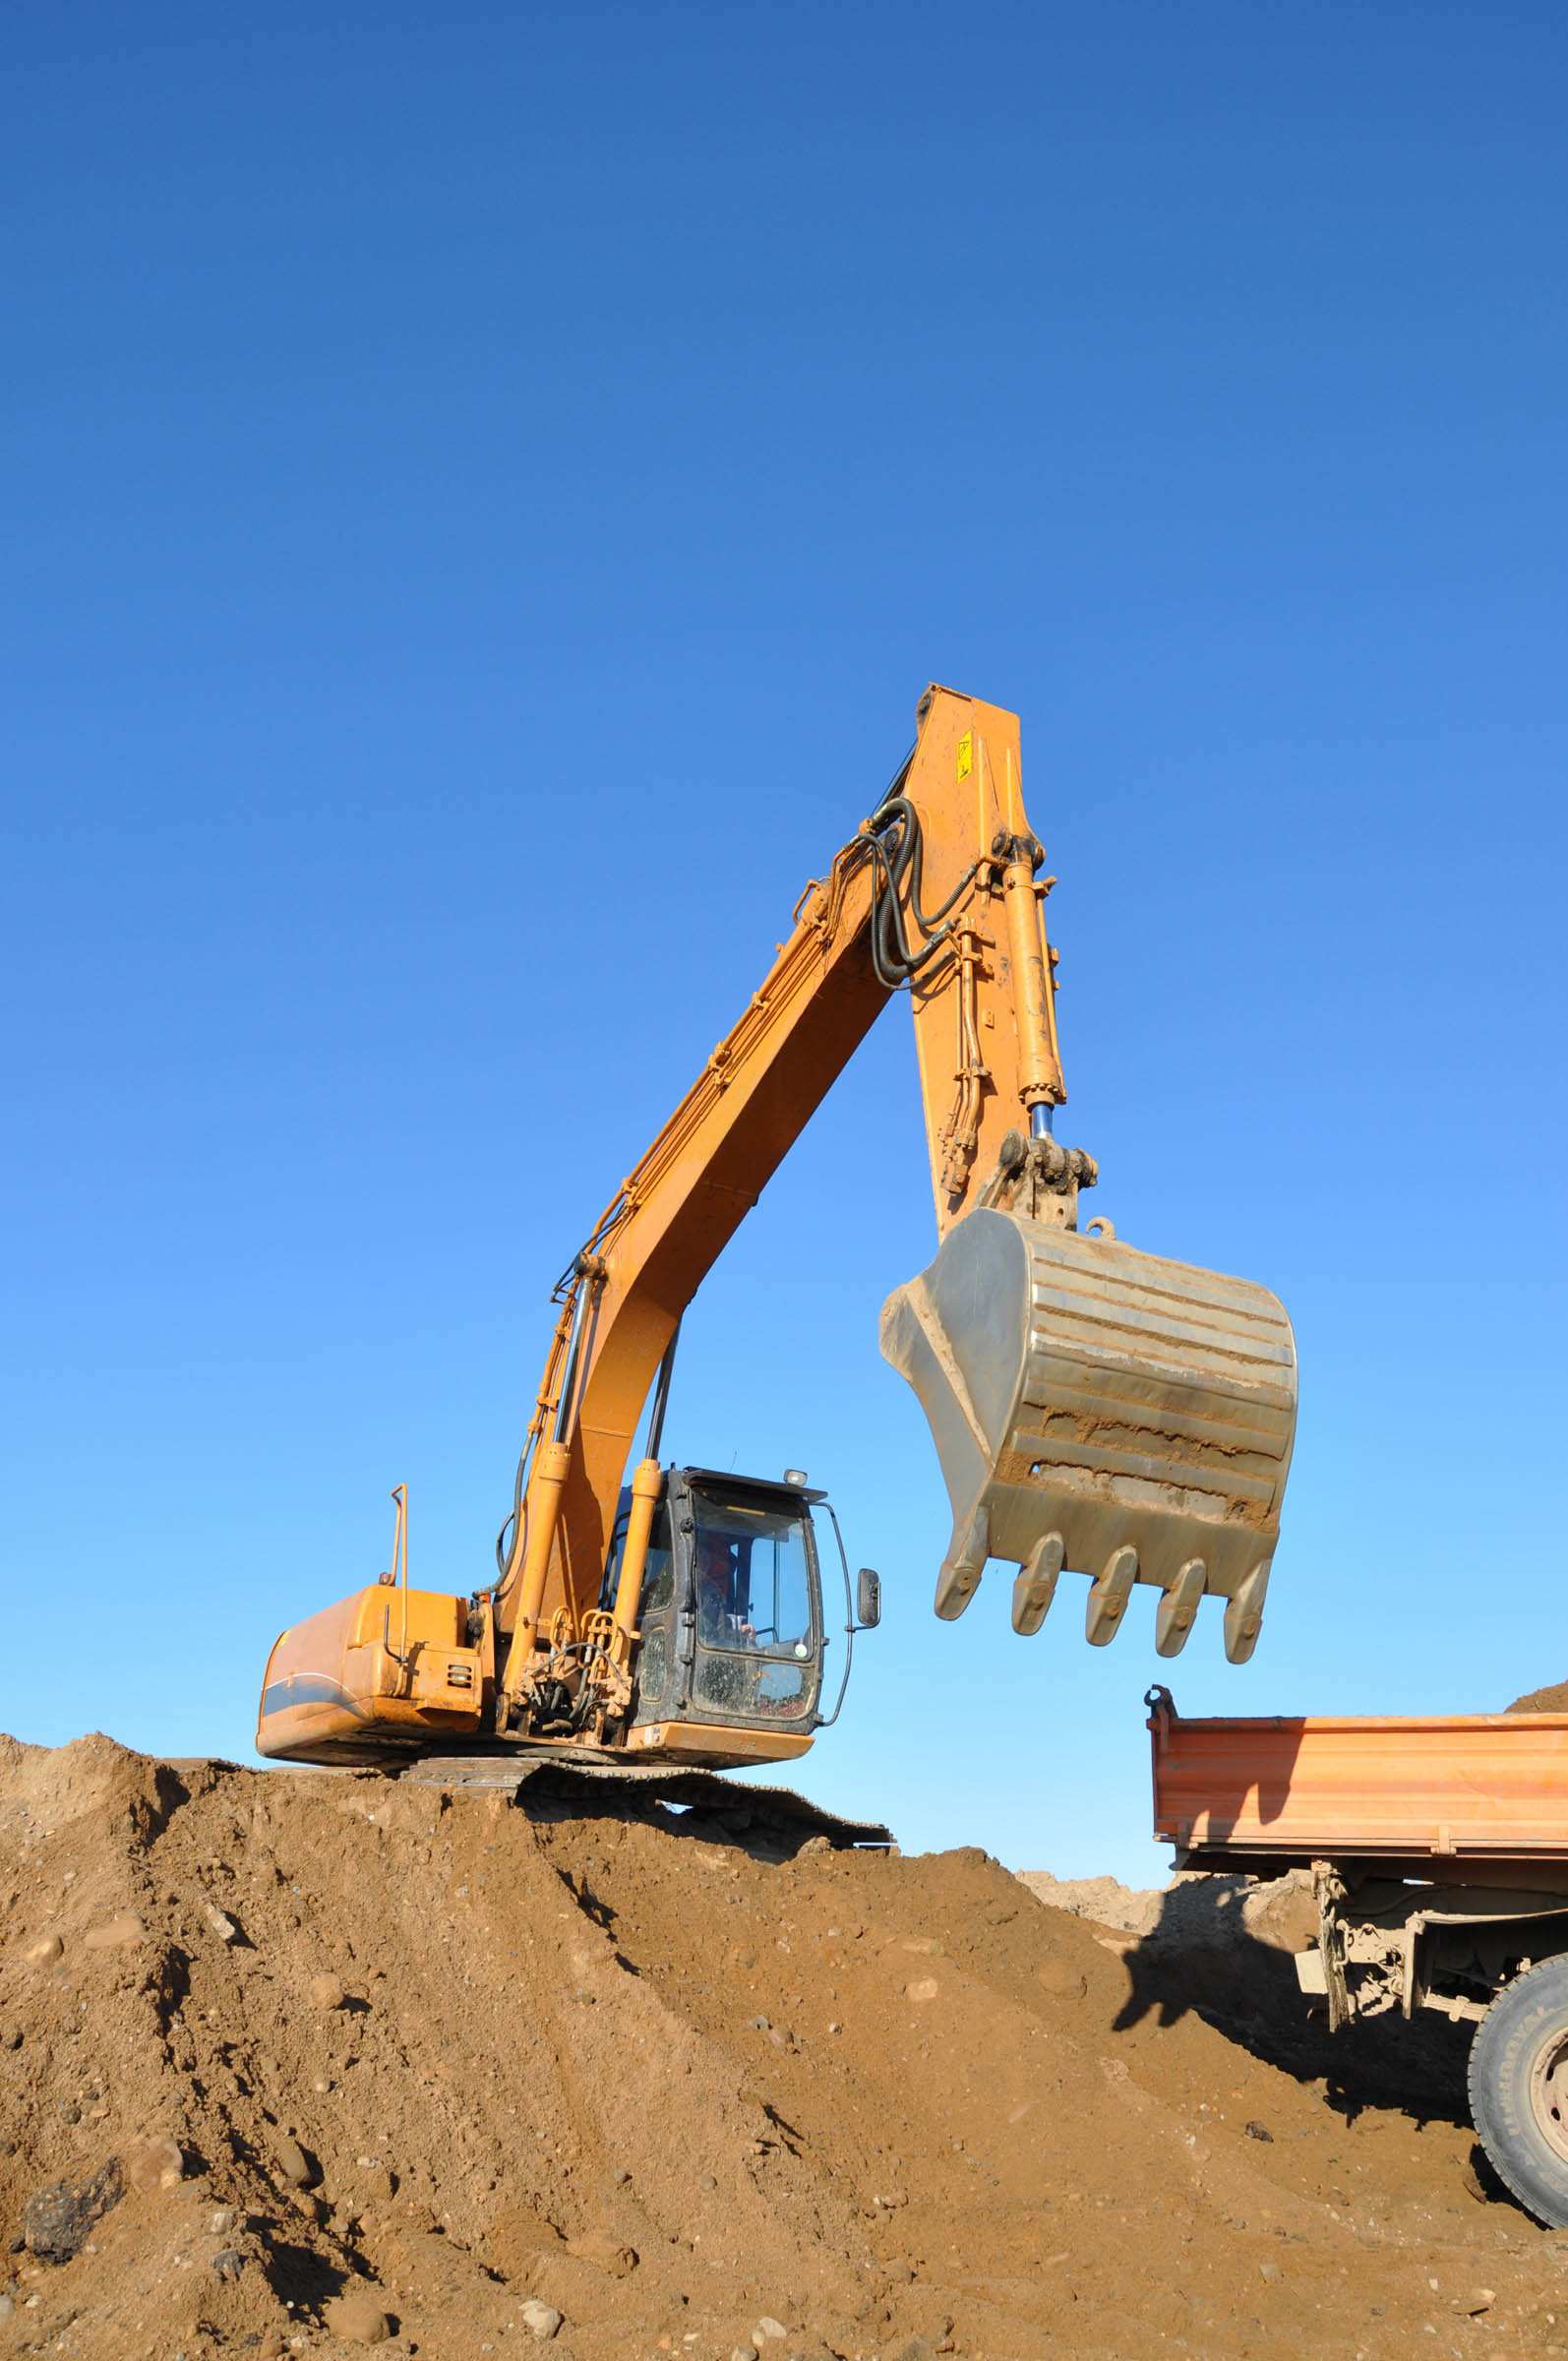 Excavator on worksite, Construction, Power, Mine, Mining, HQ Photo